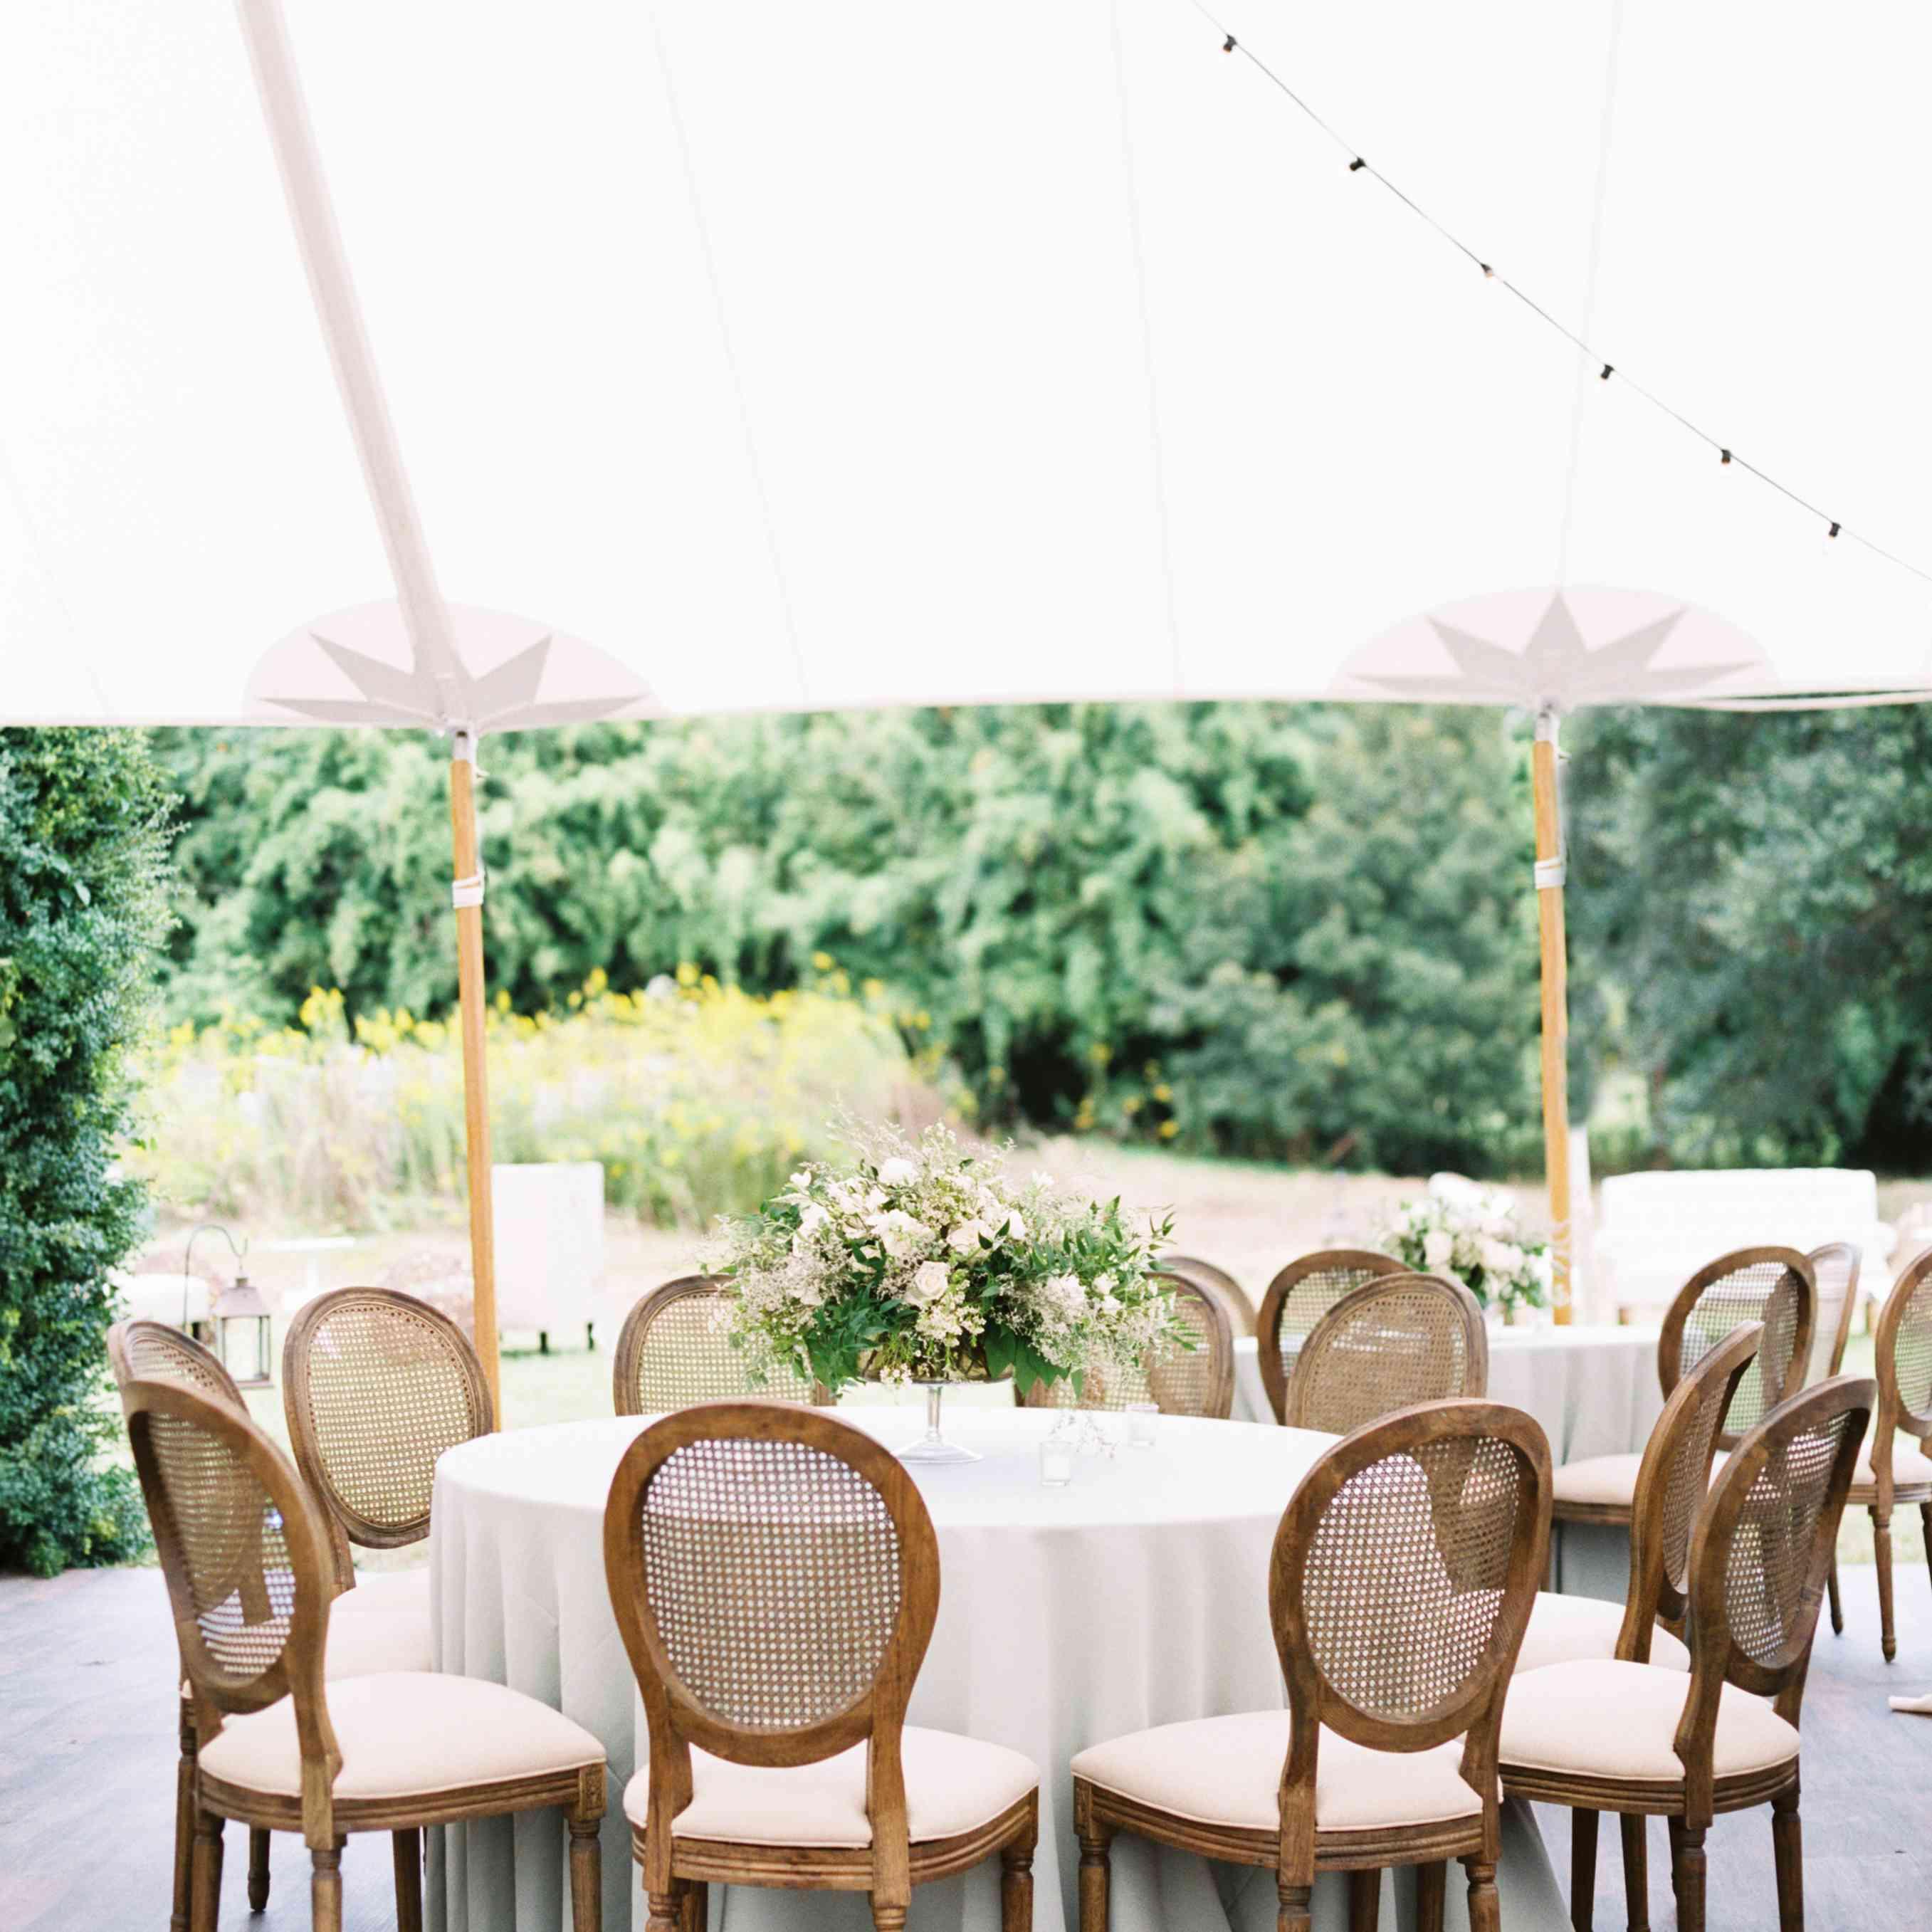 Table arrangement at reception